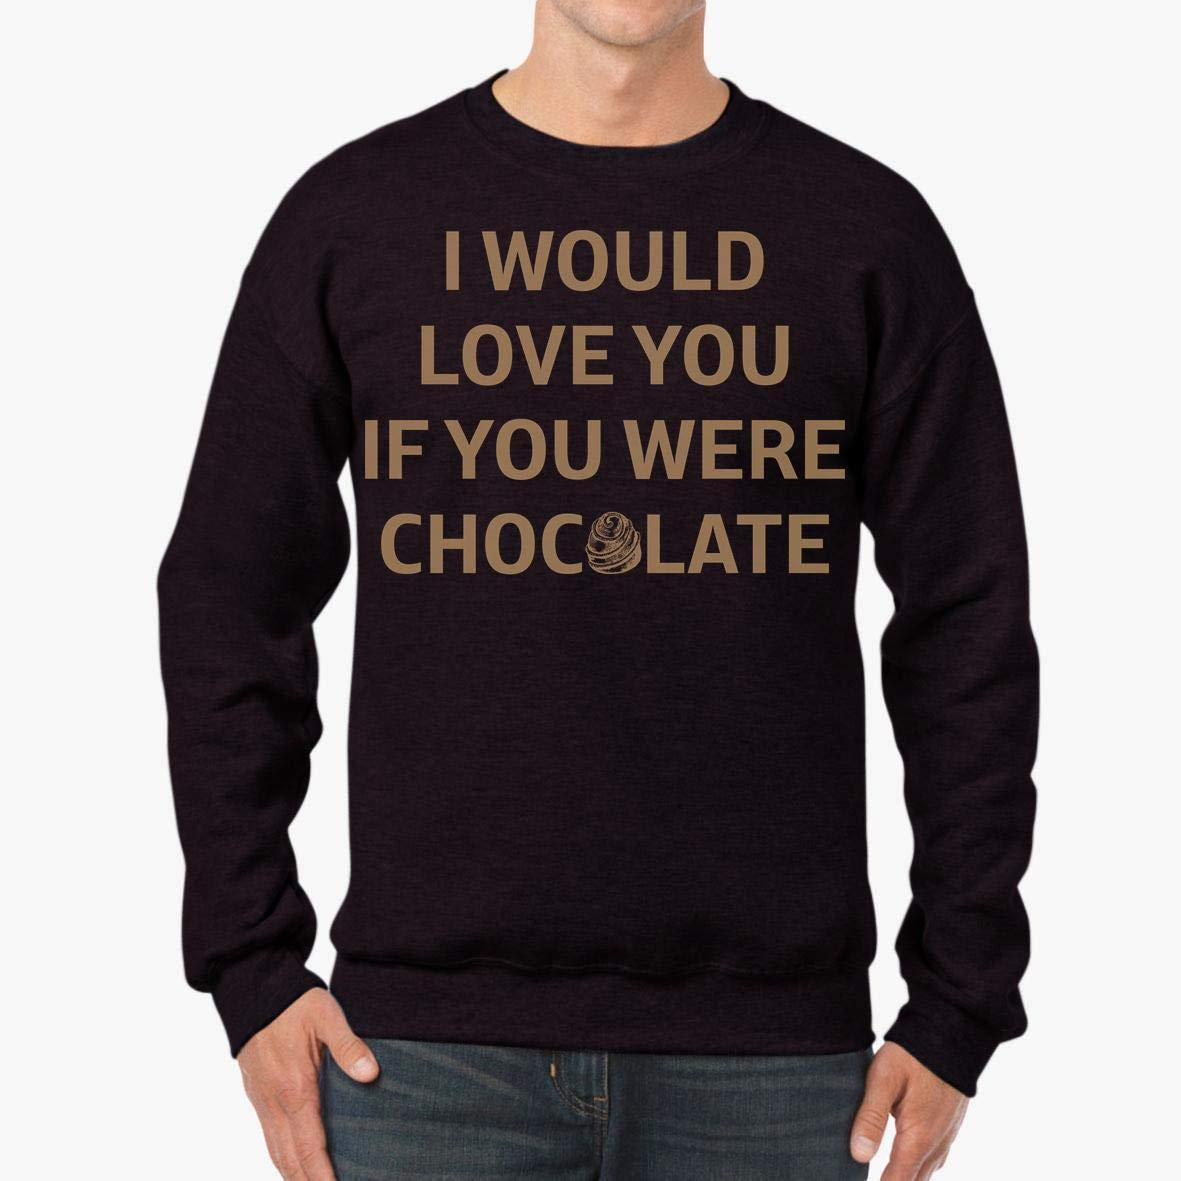 I Would Love You if You were Chocolate Funny Chocolate Gift Unisex Sweatshirt tee